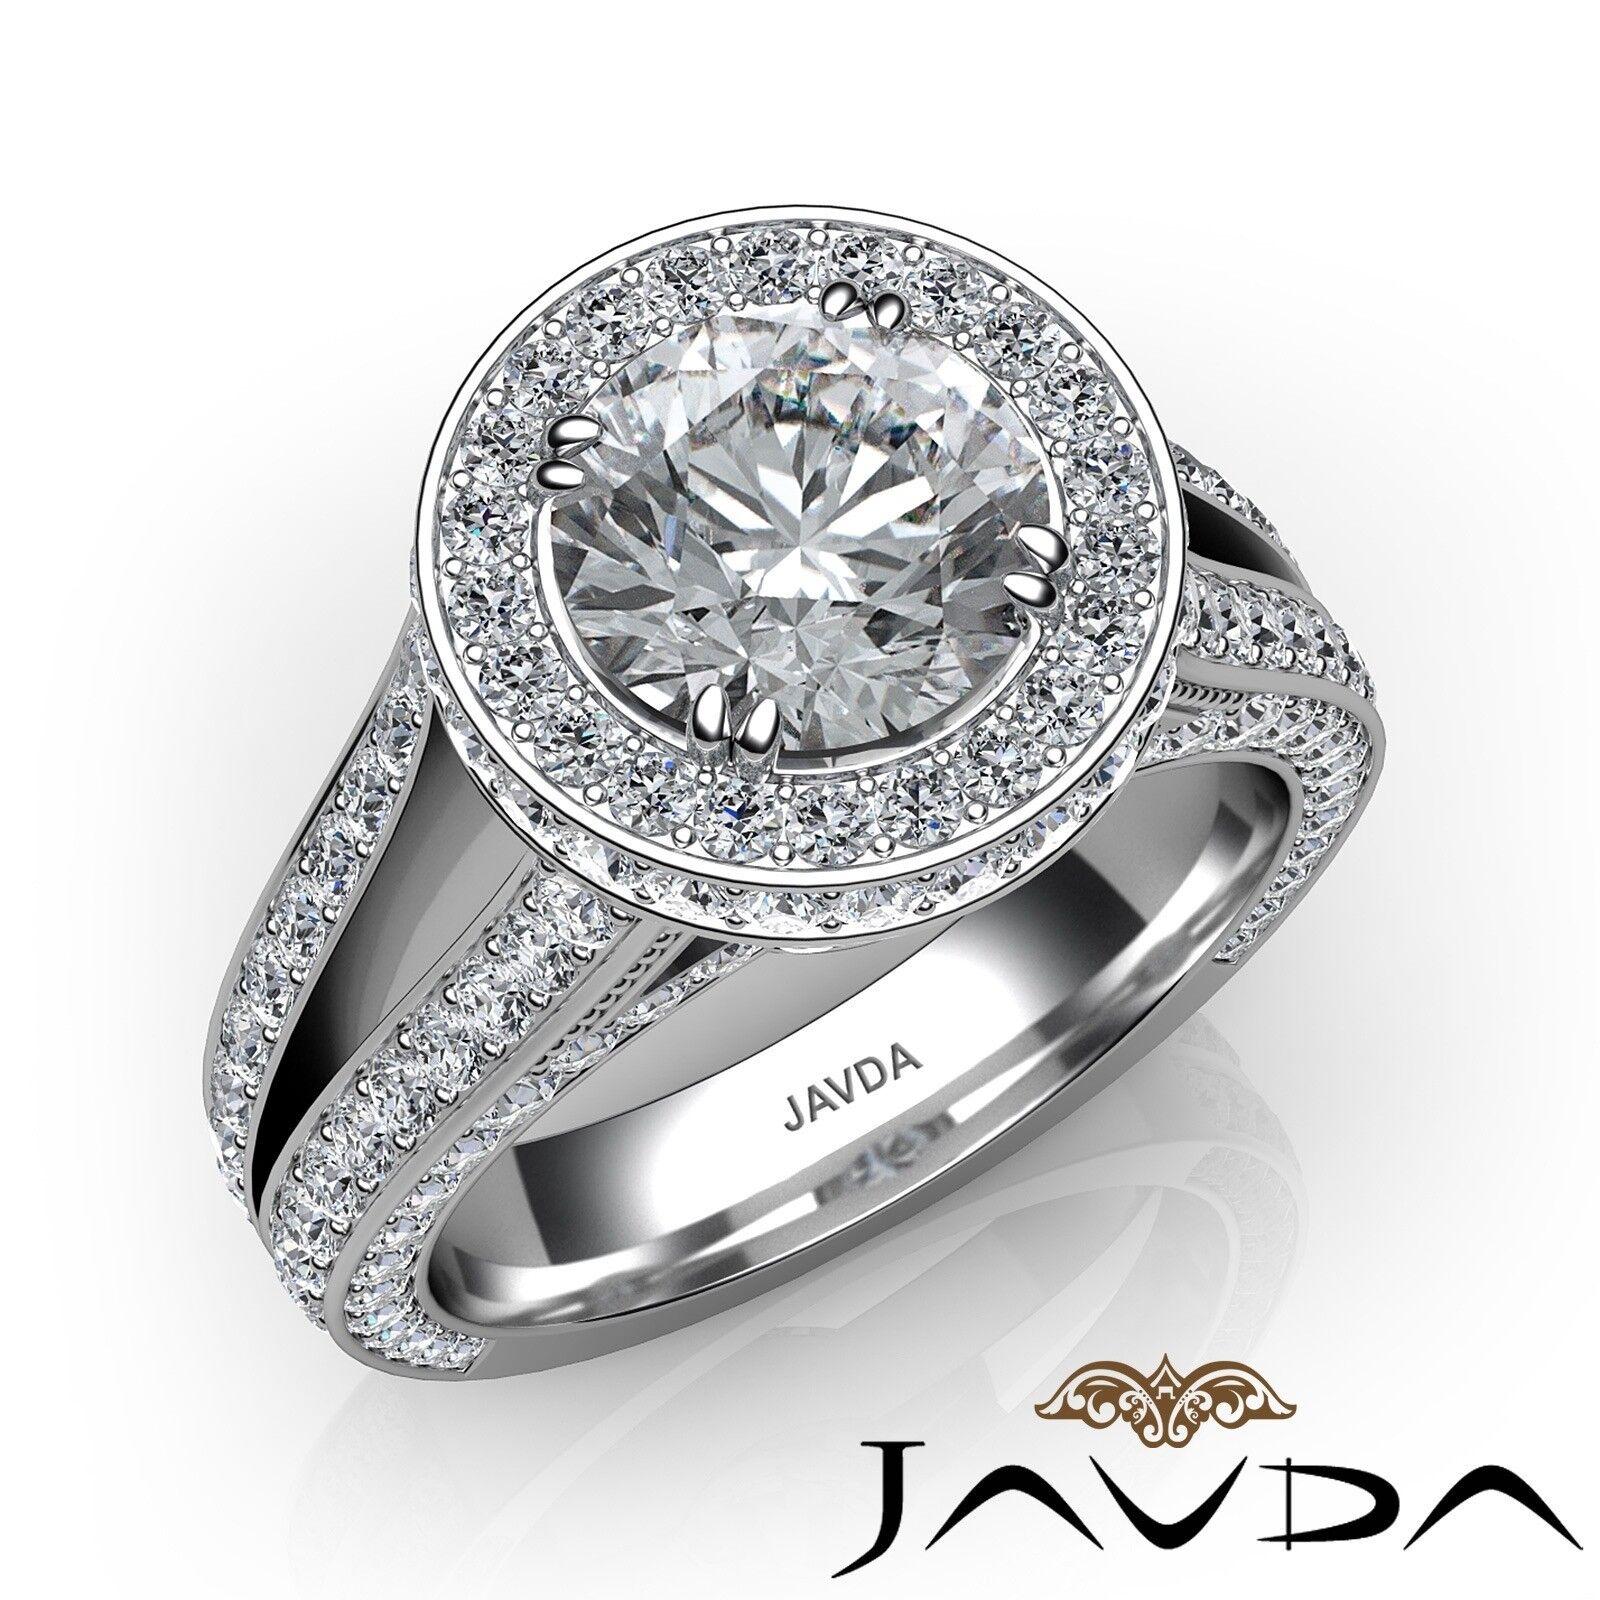 3.51ctw Halo Split Shank Bridge Round Diamond Engagement Ring GIA I-VVS2 W Gold